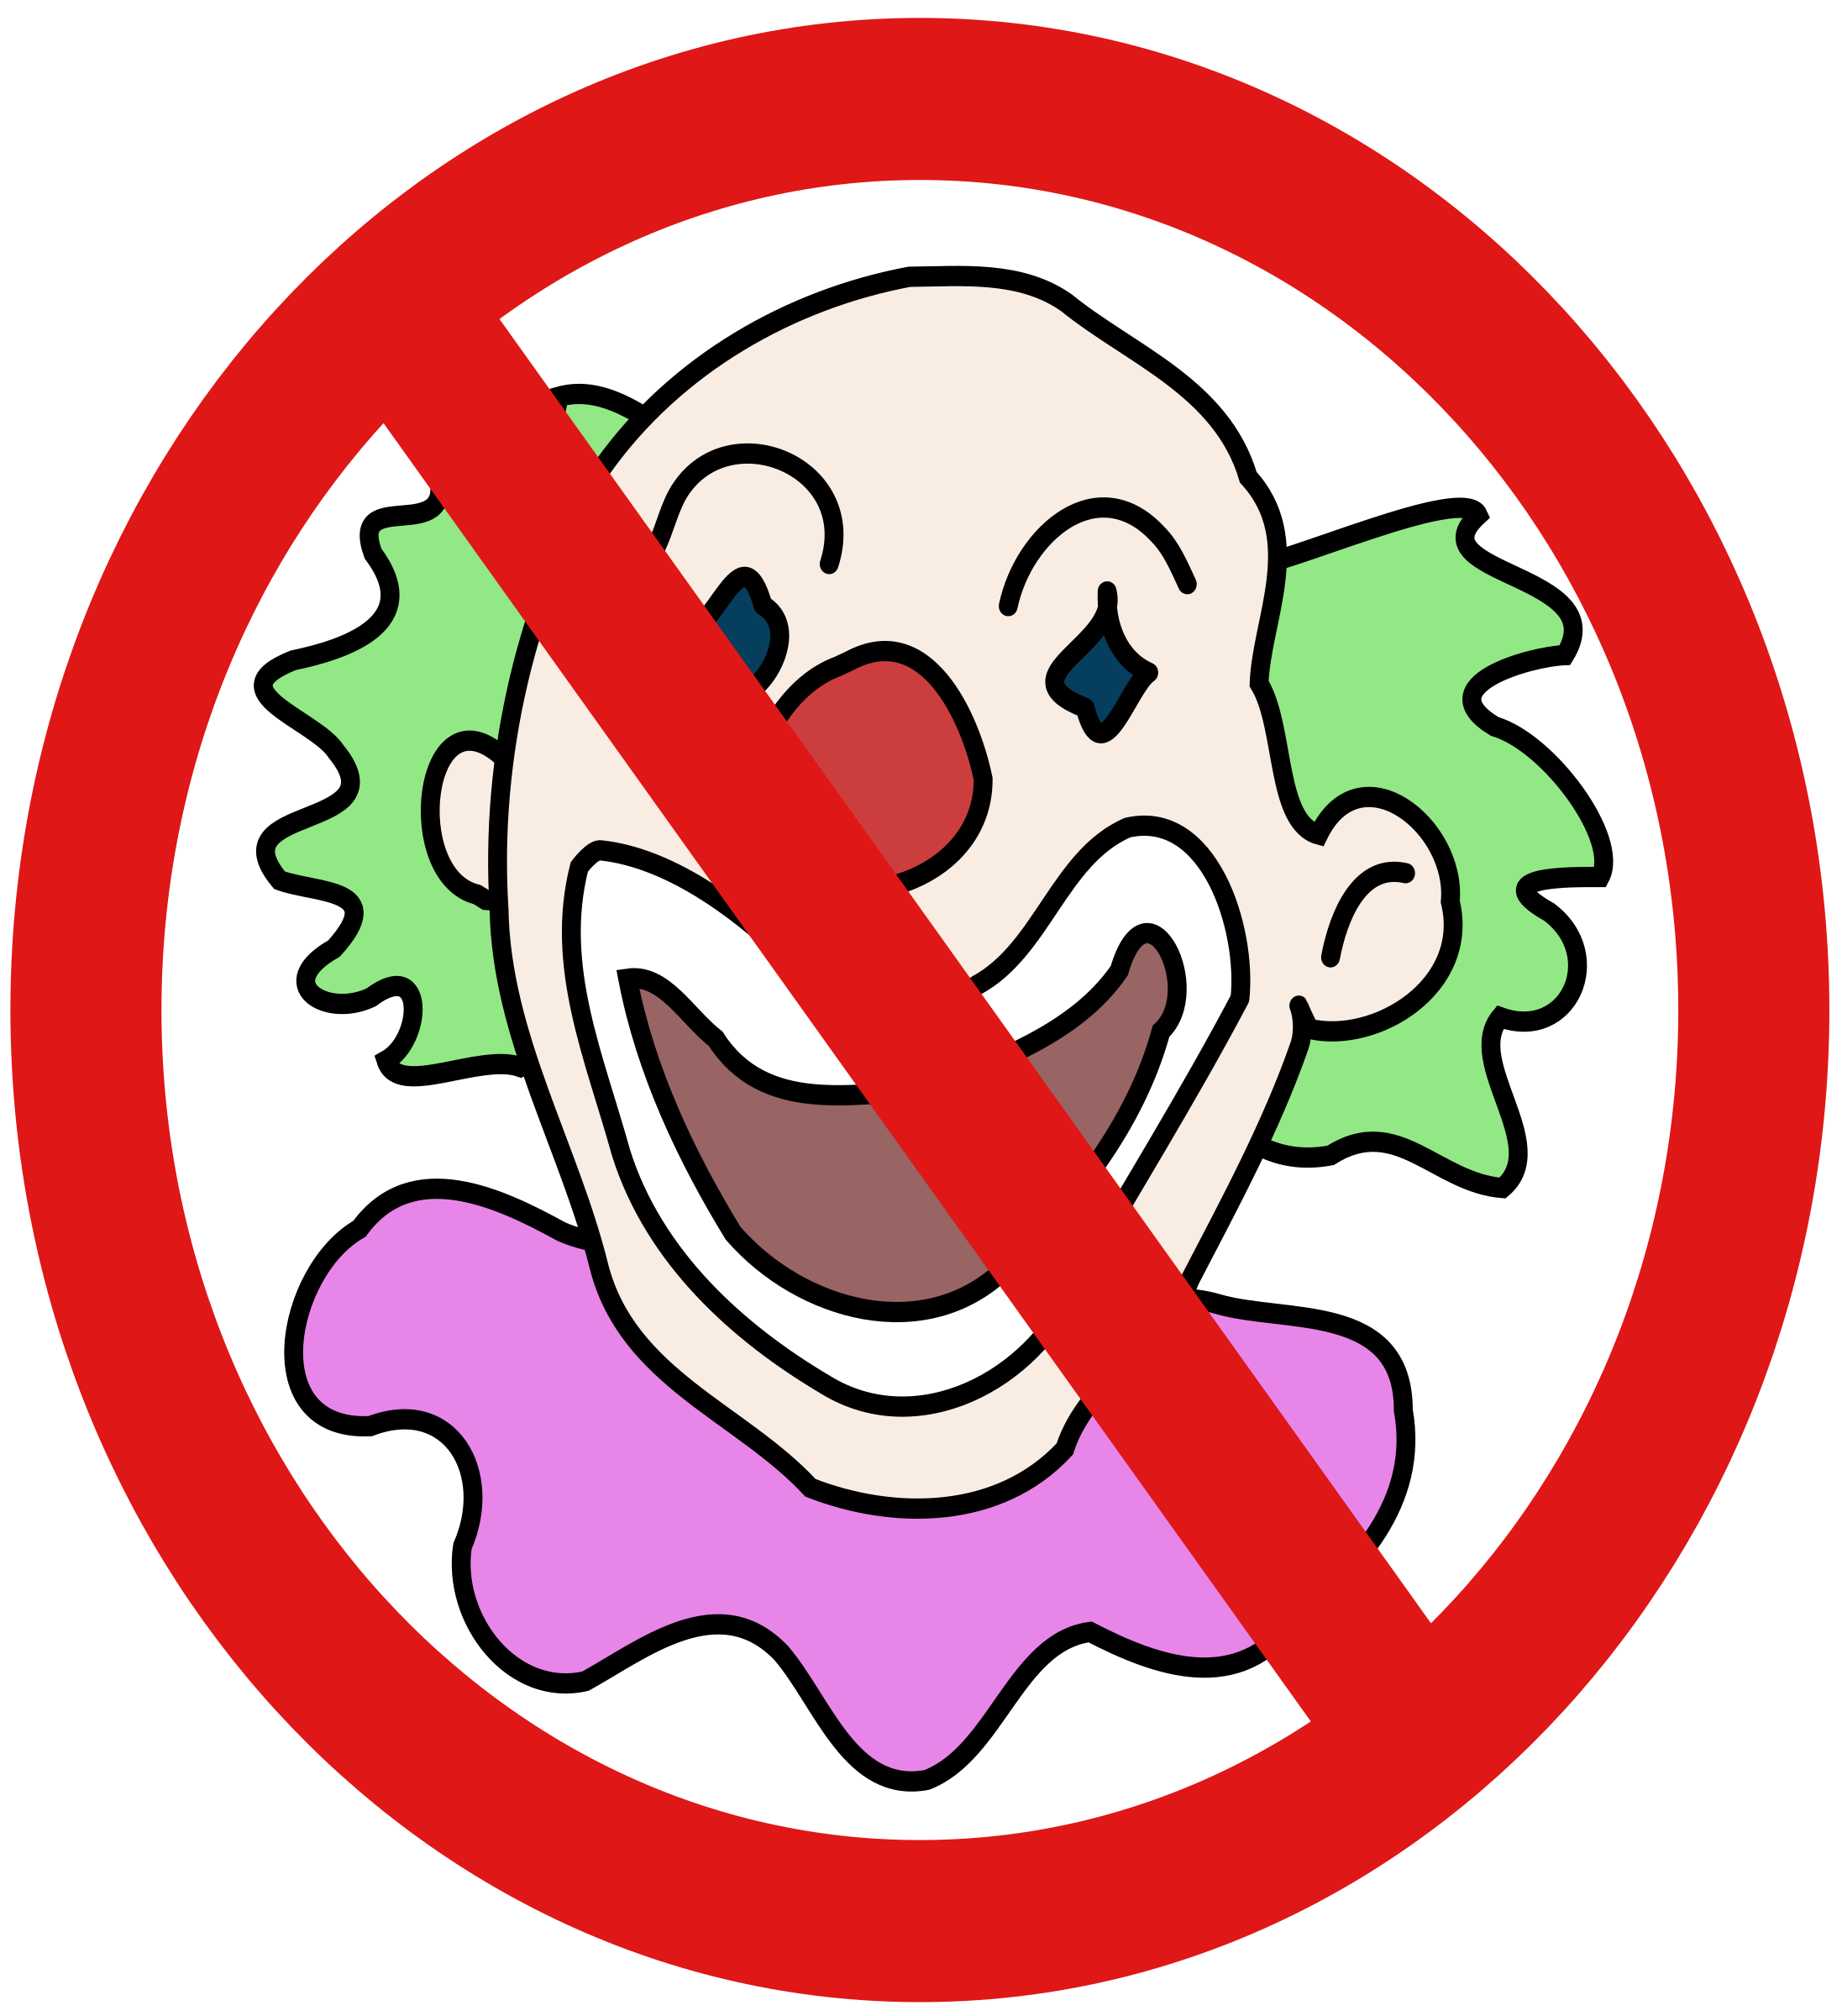 No clowns big image. Line clipart modern